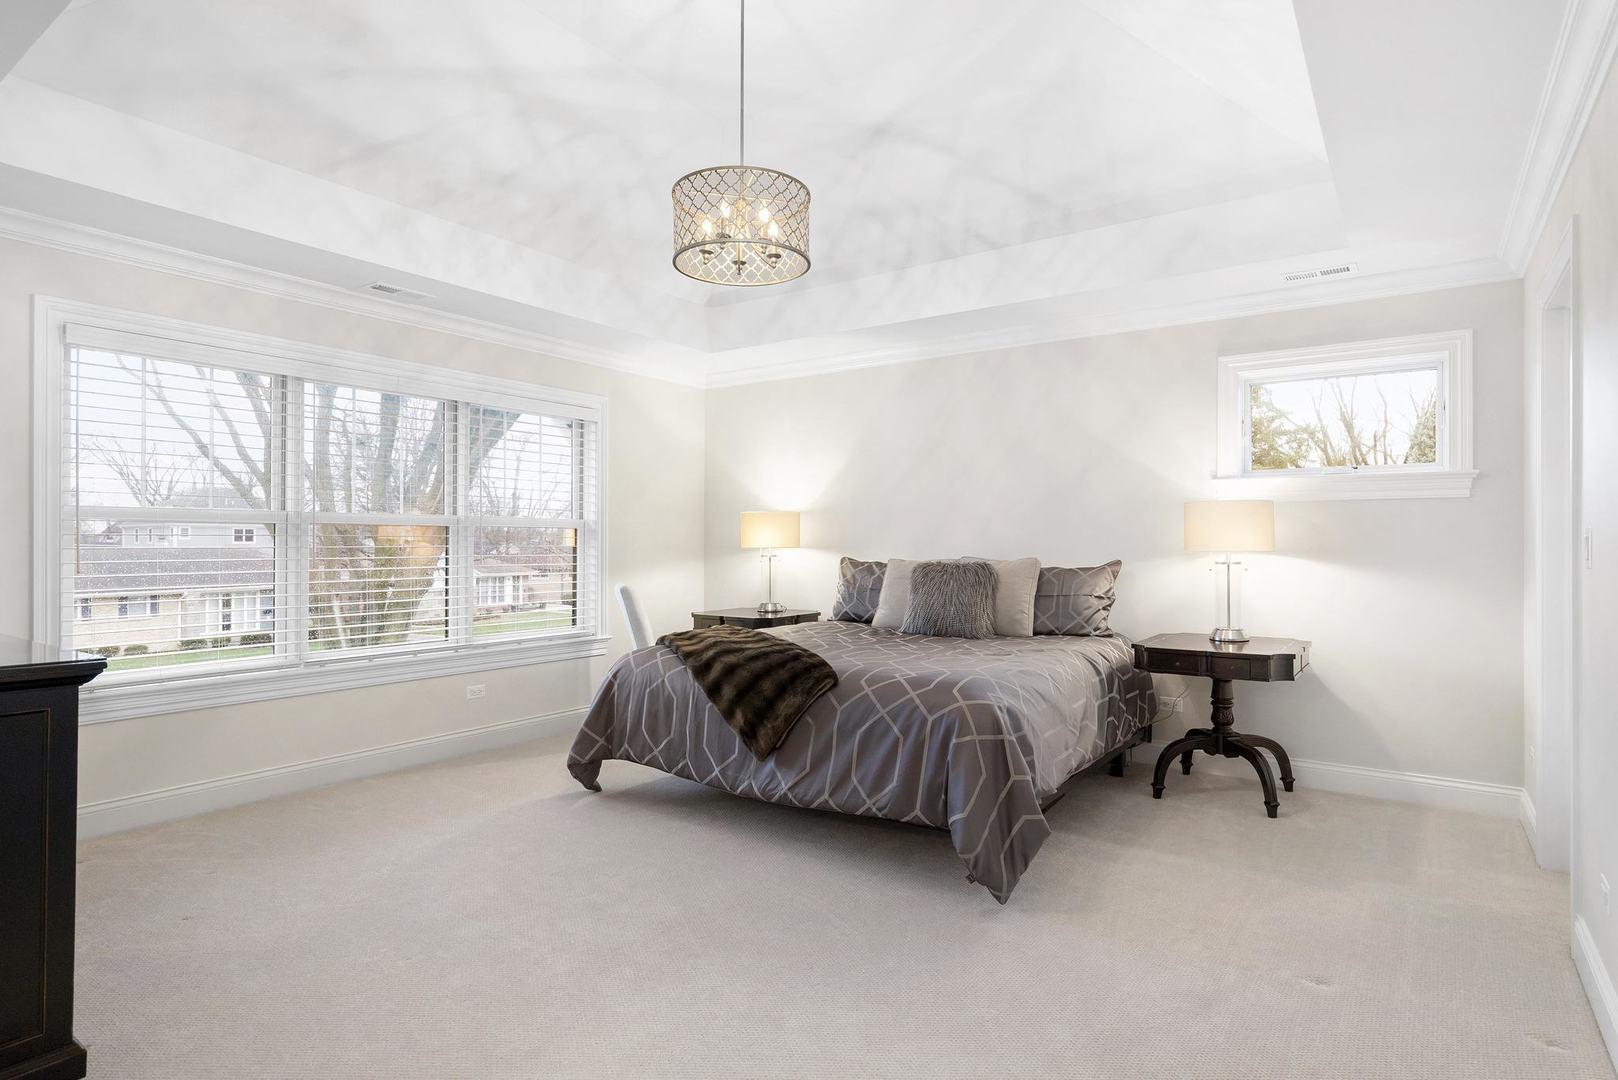 407 Highland Avenue, Elmhurst, Illinois 60126, 5 Bedrooms Bedrooms, ,3 BathroomsBathrooms,Residential,For Sale,Highland,MRD11225348